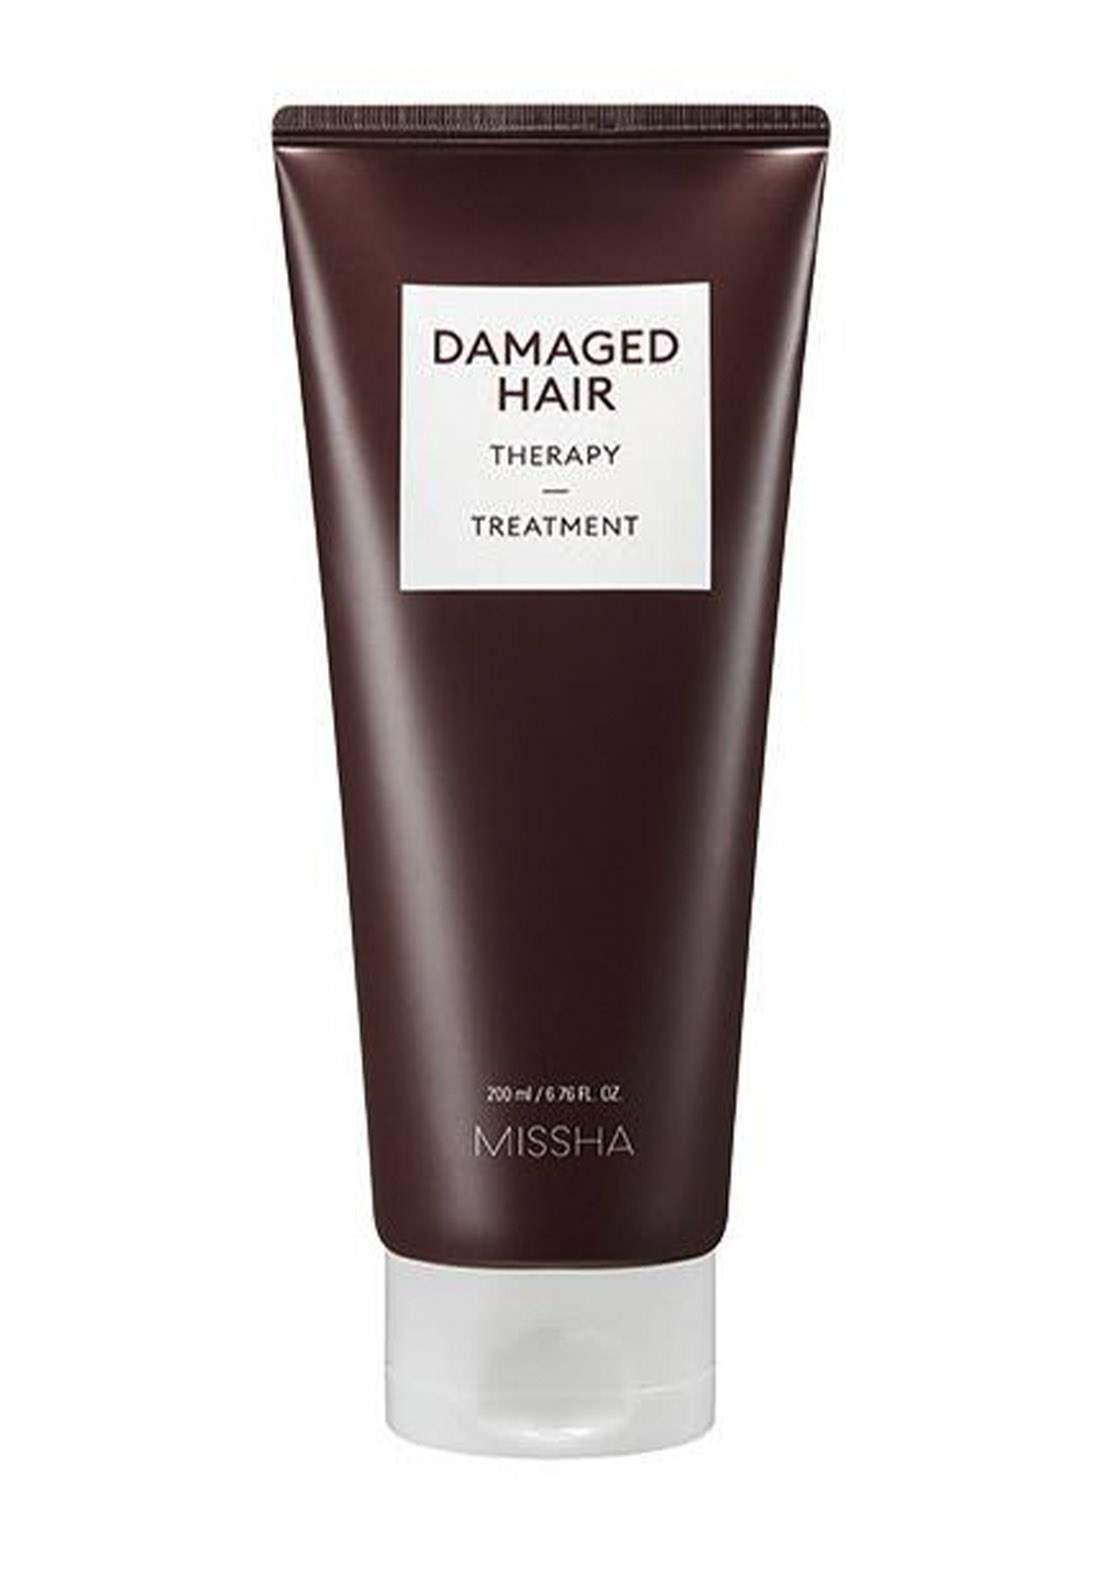 Missha Damaged Hair Therapy Treatment 200ml معالج للشعر التالف